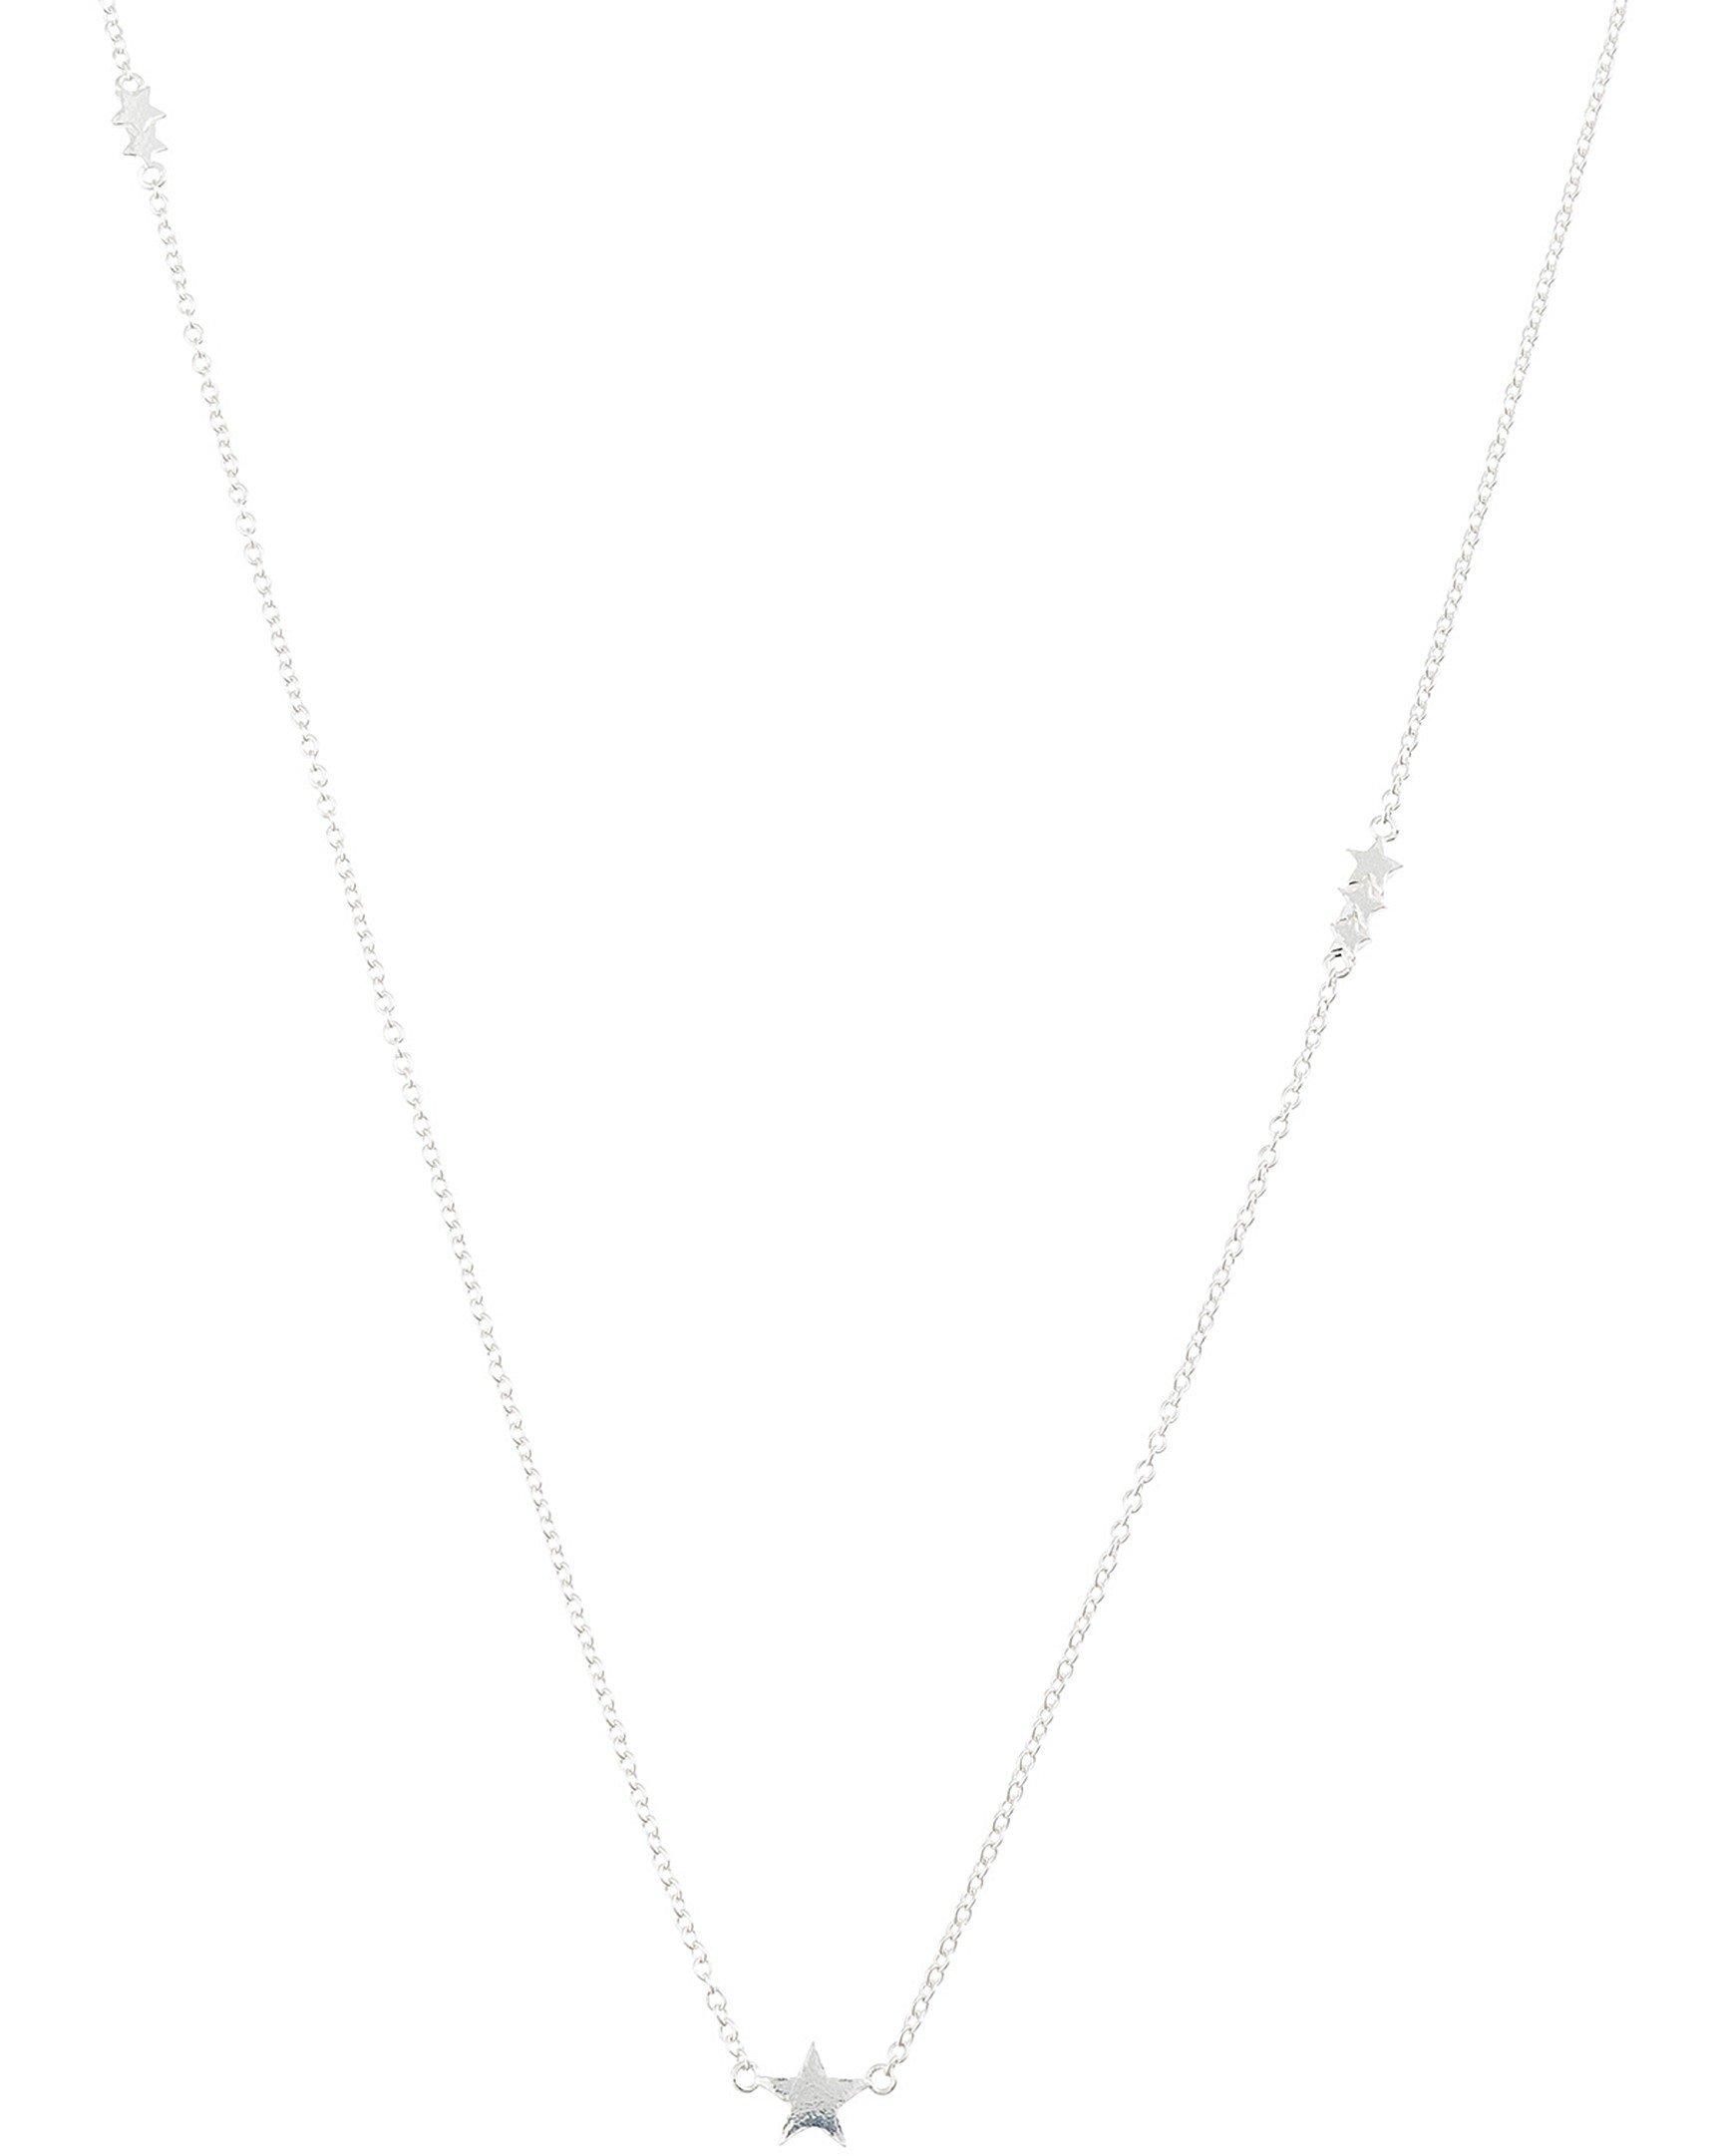 Pendant Necklaces Jewelry & Accessories Silver Swinging Girl Pendant Black Metallic Chain Women Necklace